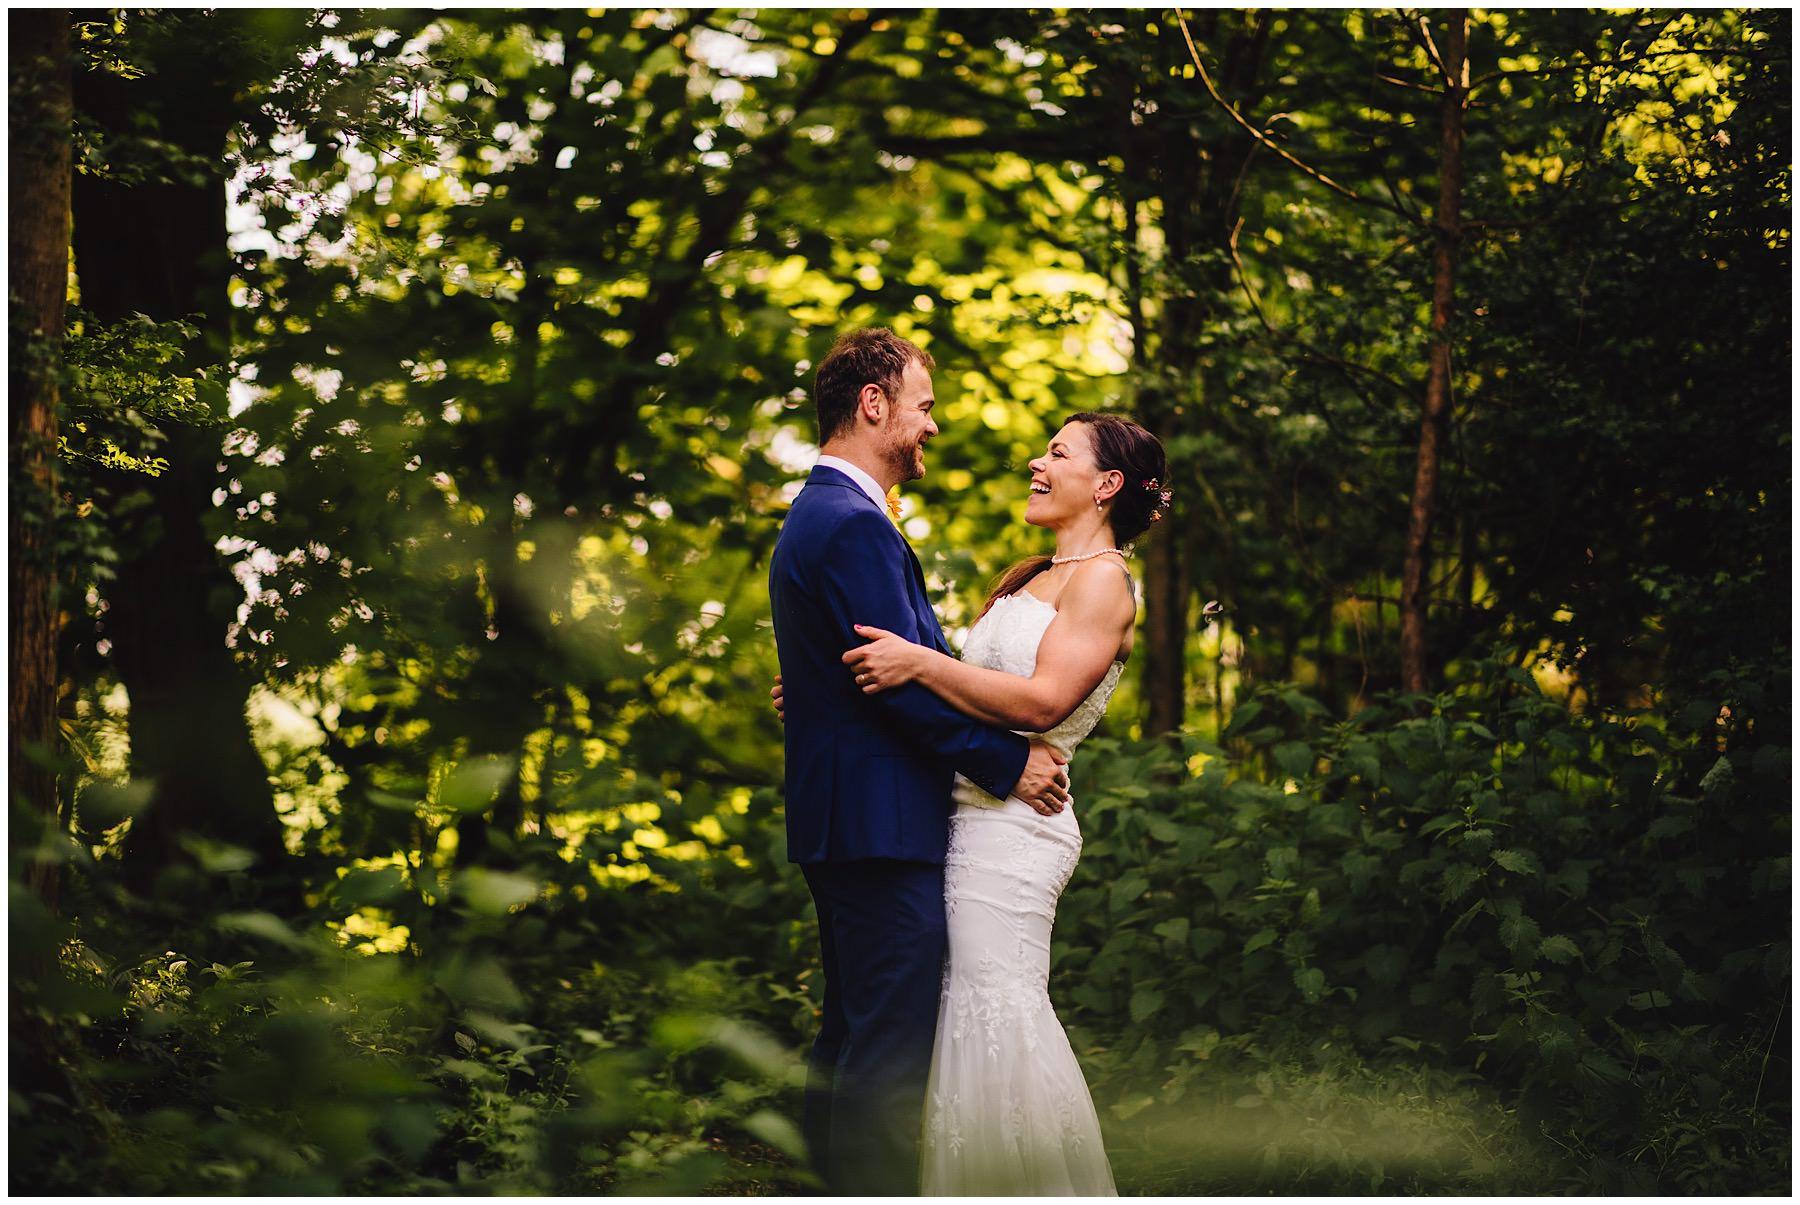 Hothorp Hall Woodlands Wedding Photographer 31